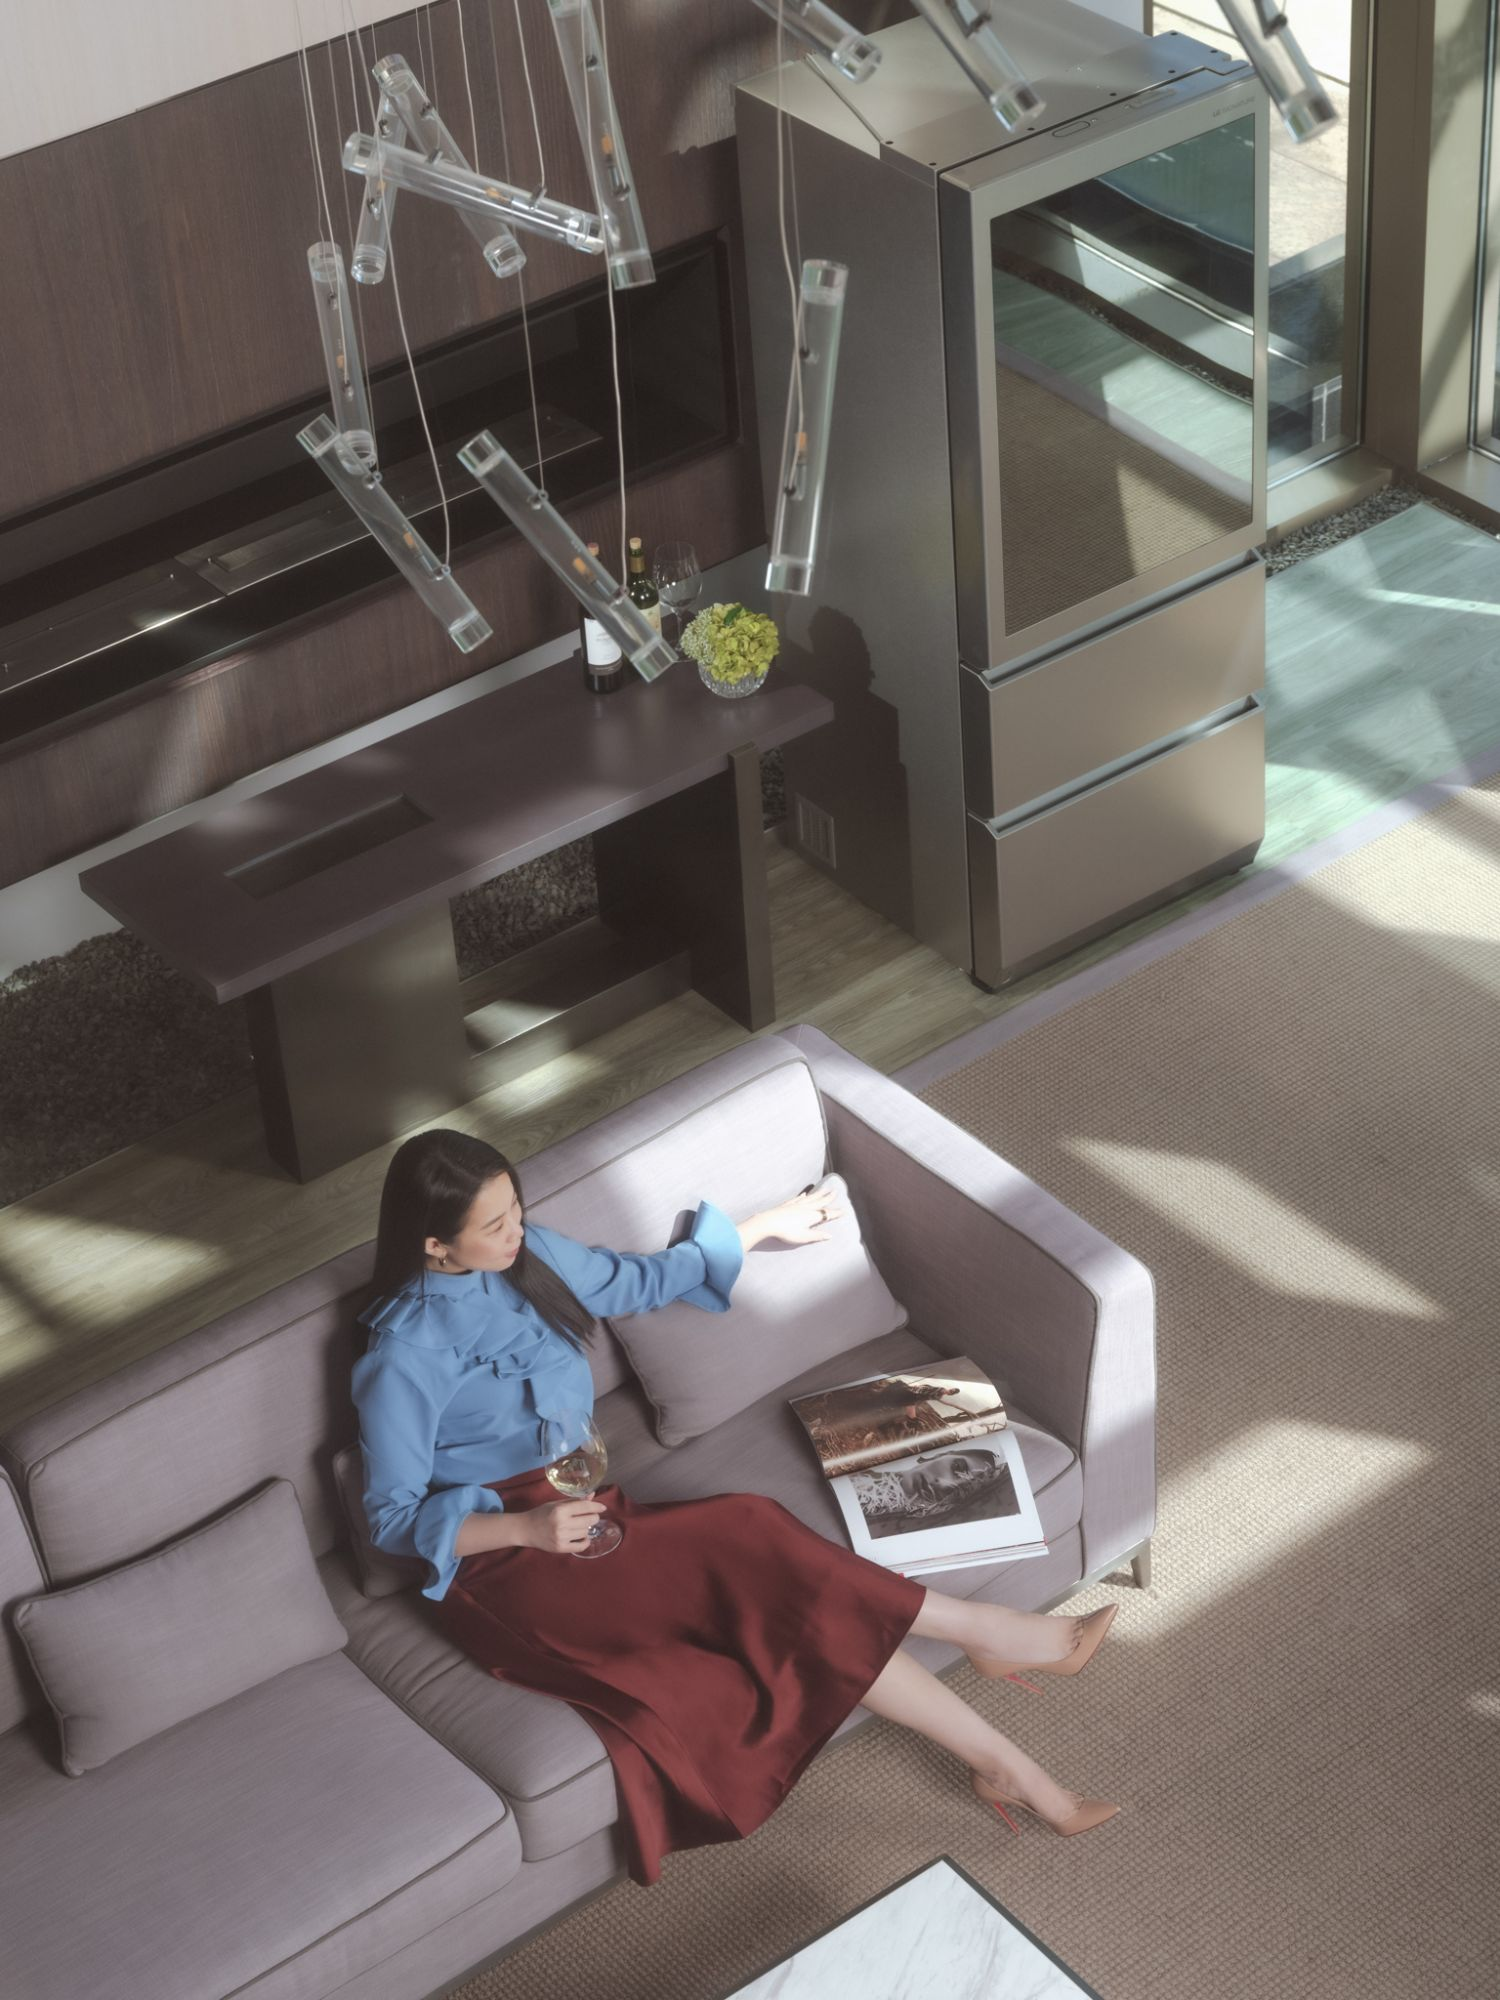 Tatler Taiwan 總編李瑜對於居家環境的堅持,須兼具美感和實用性 — LG SIGNATURE 系列讓生活更便利舒適